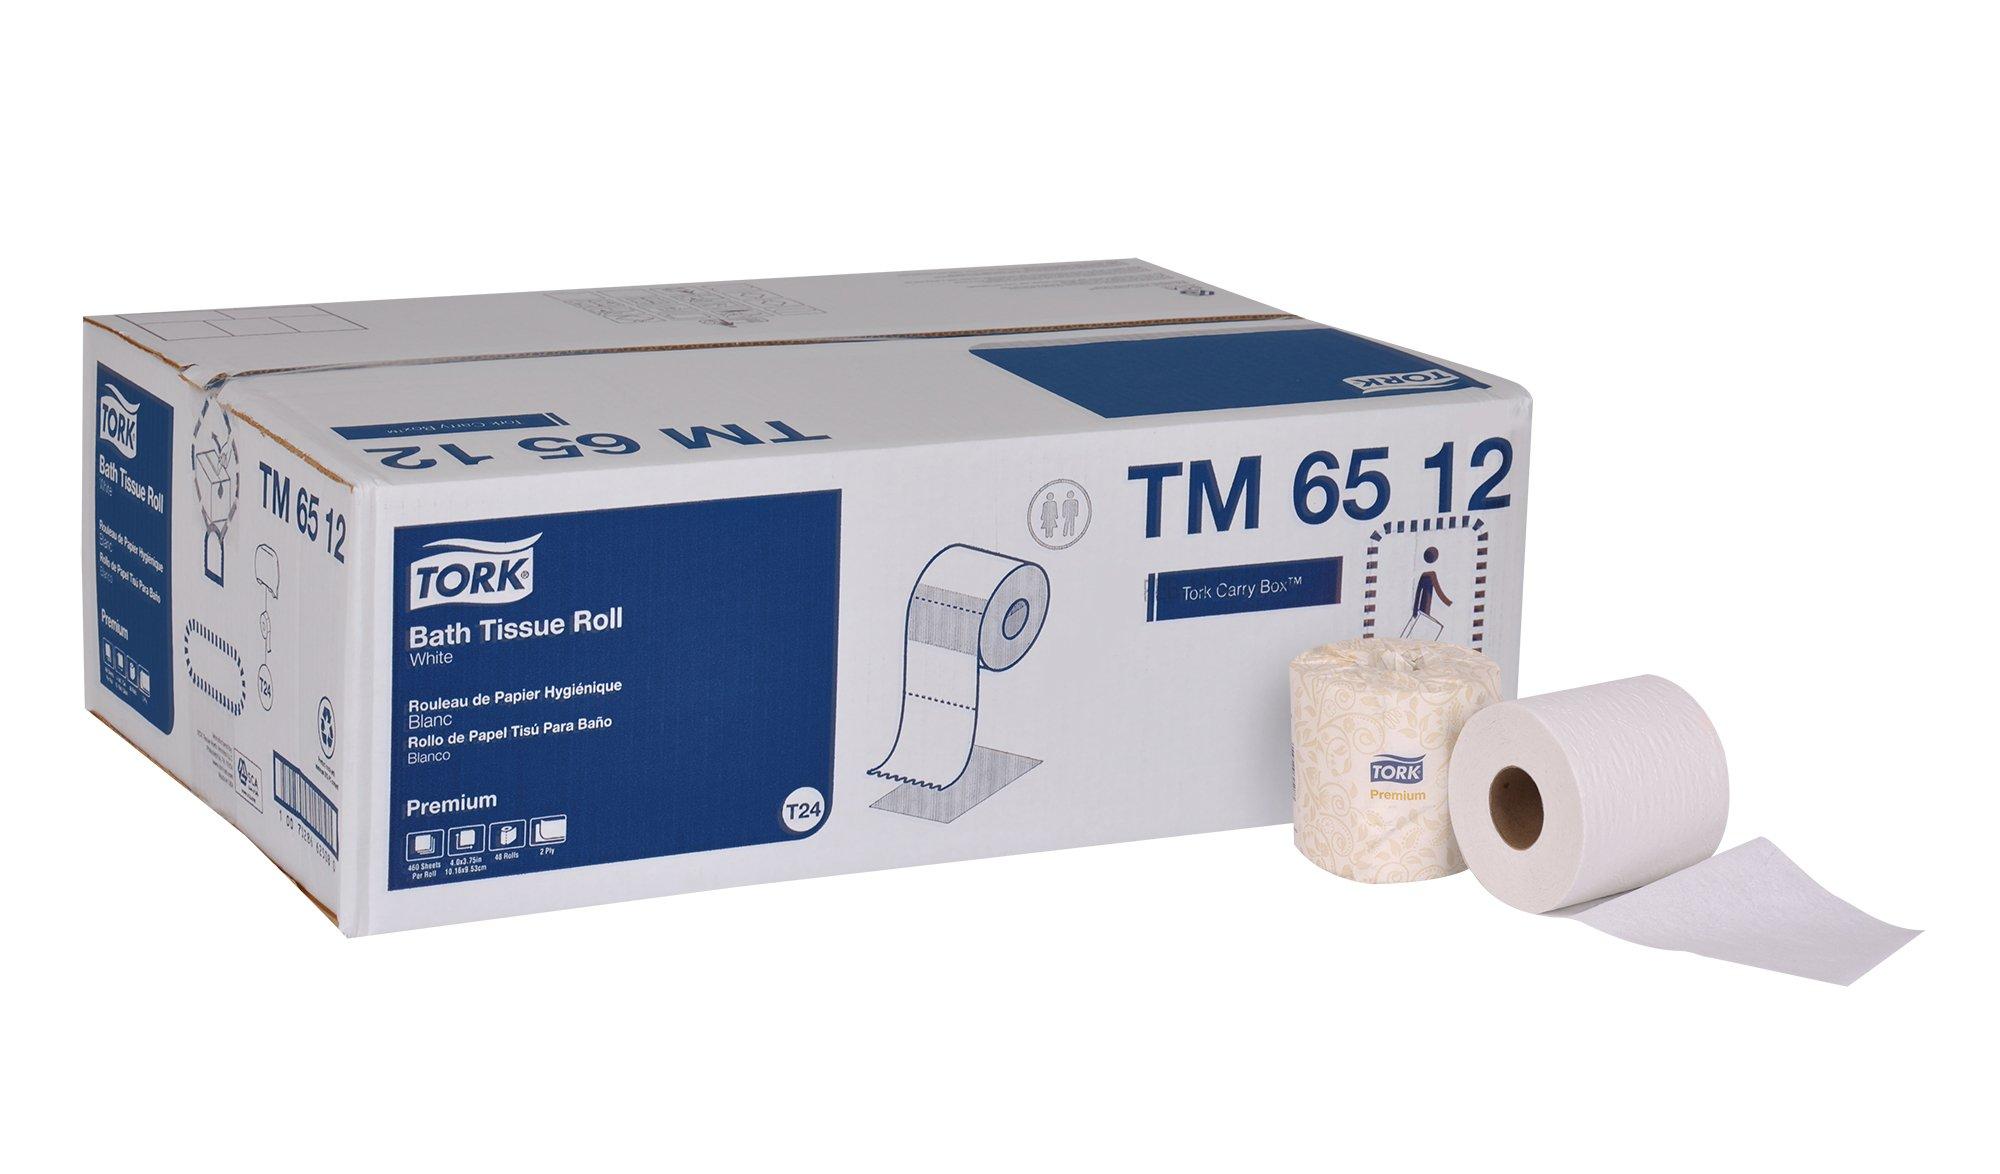 Tork Premium TM6512 Bath Tissue Roll, 2-Ply, 4'' Width x 3.75'' Length, White (Case of 48 Rolls, 460 per Roll, 22,080 Sheets)